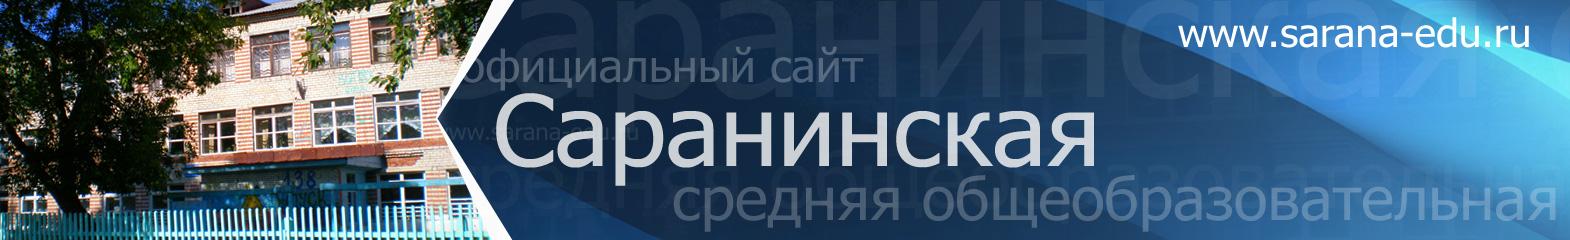 МКОУ Саранинская школа